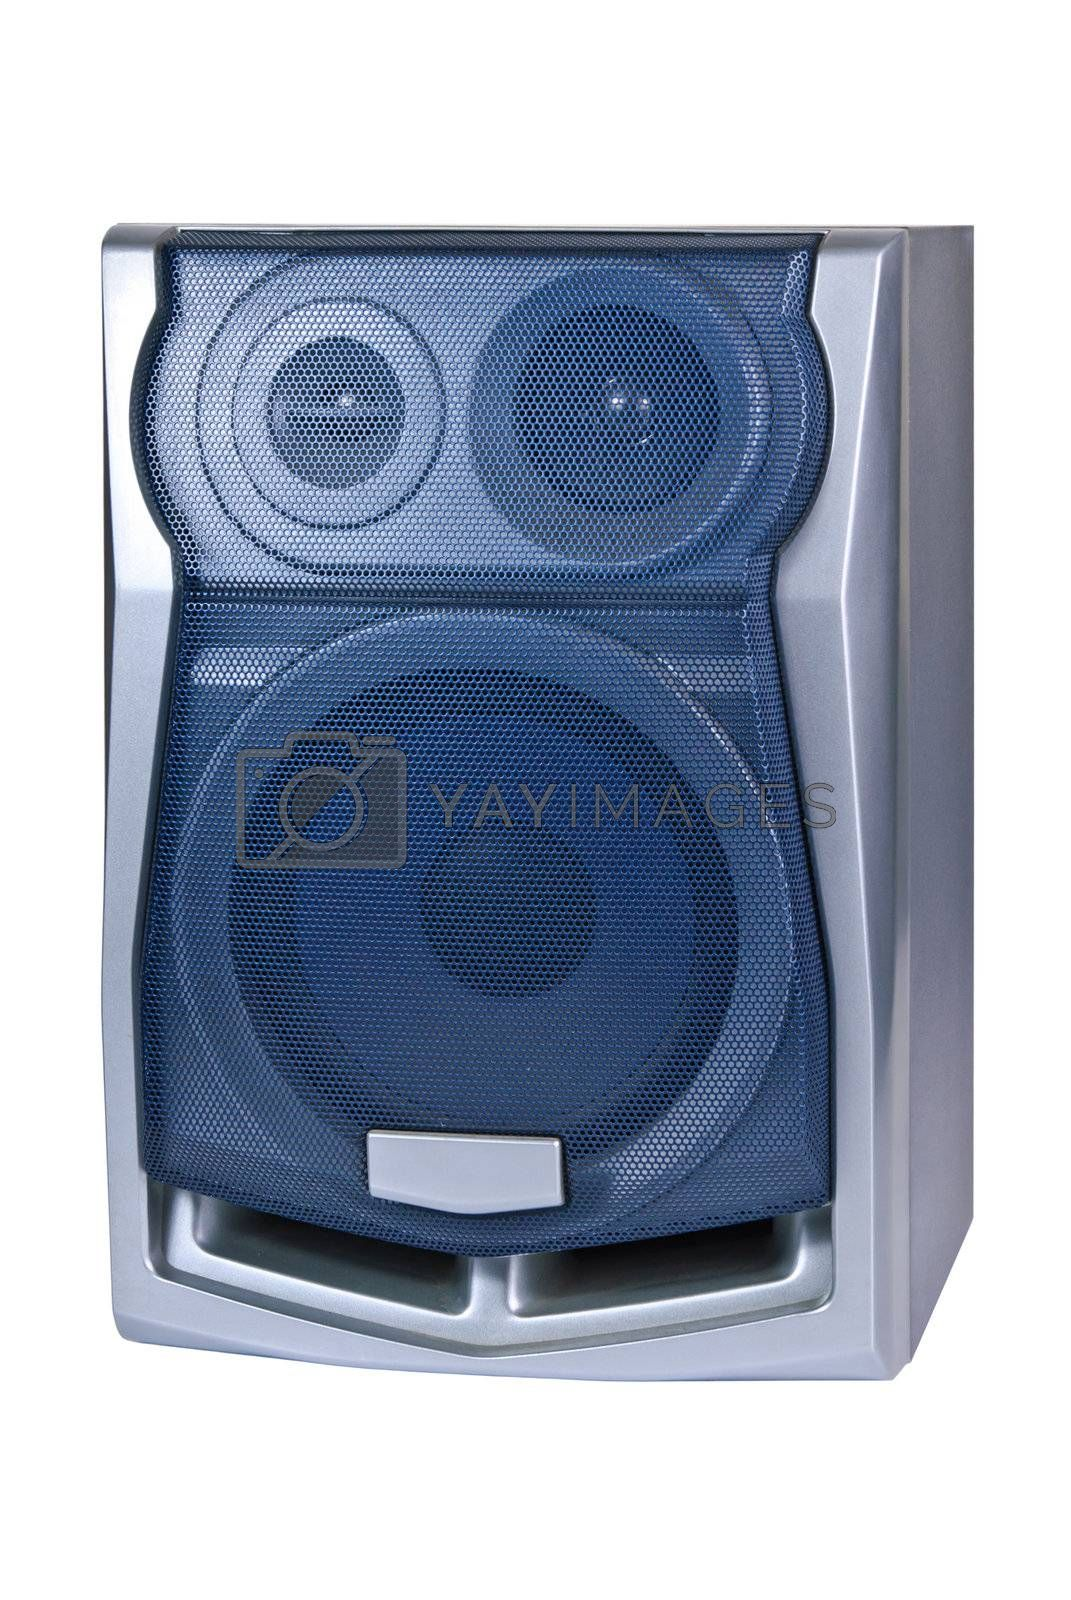 Audio speaker isolated on white background, musical equipment